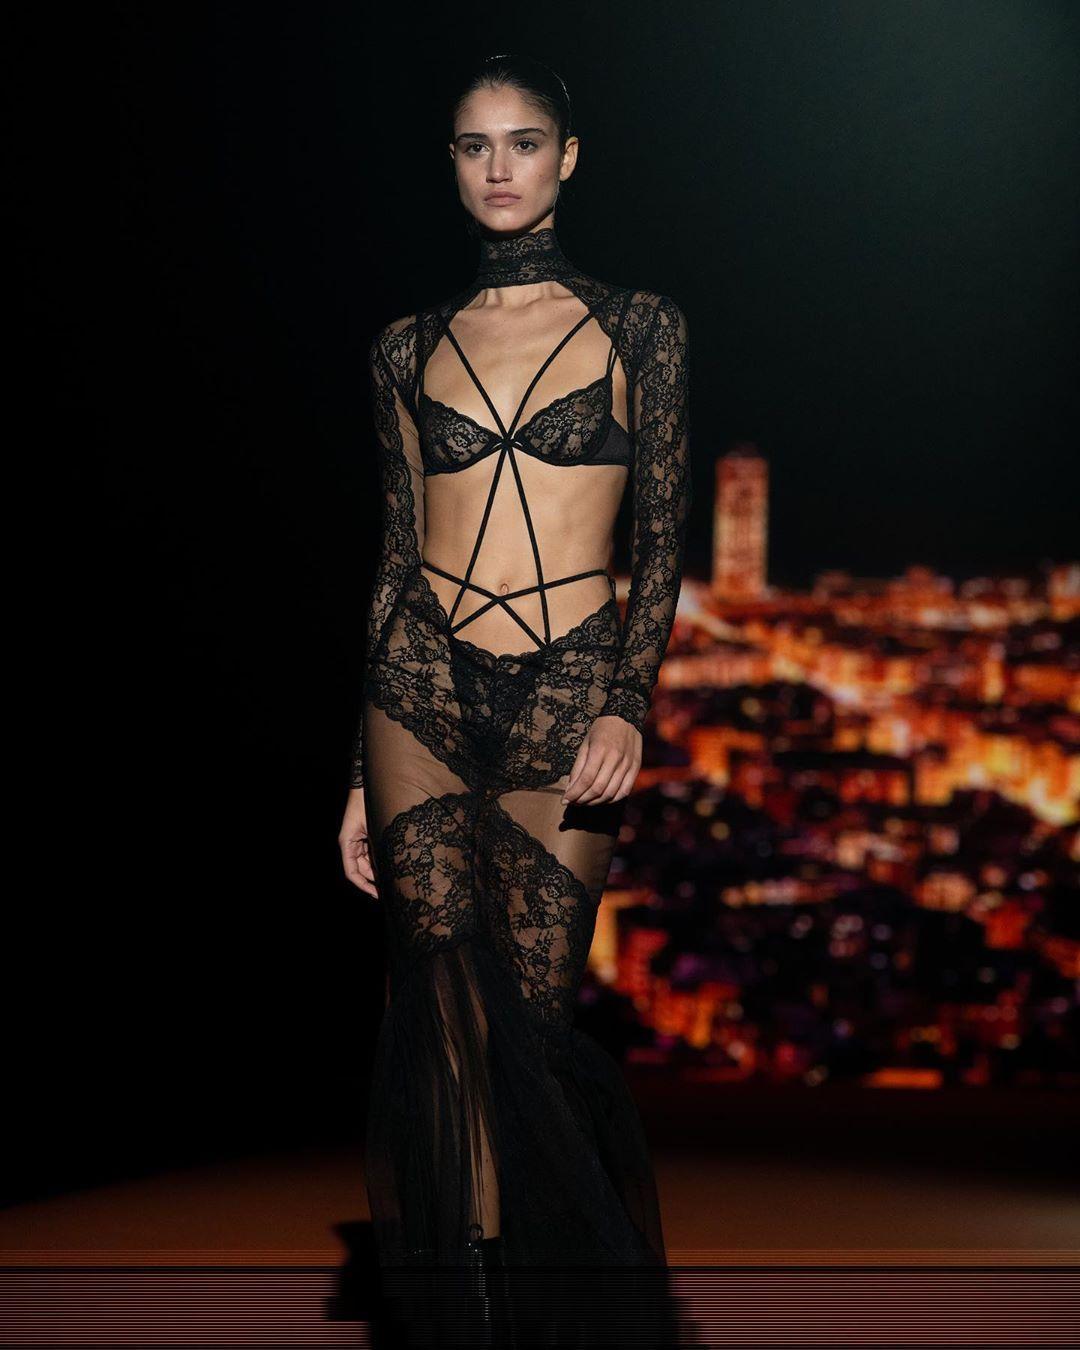 Claudia Martin's Tits At The Andres Sarda Fashion Show 0002